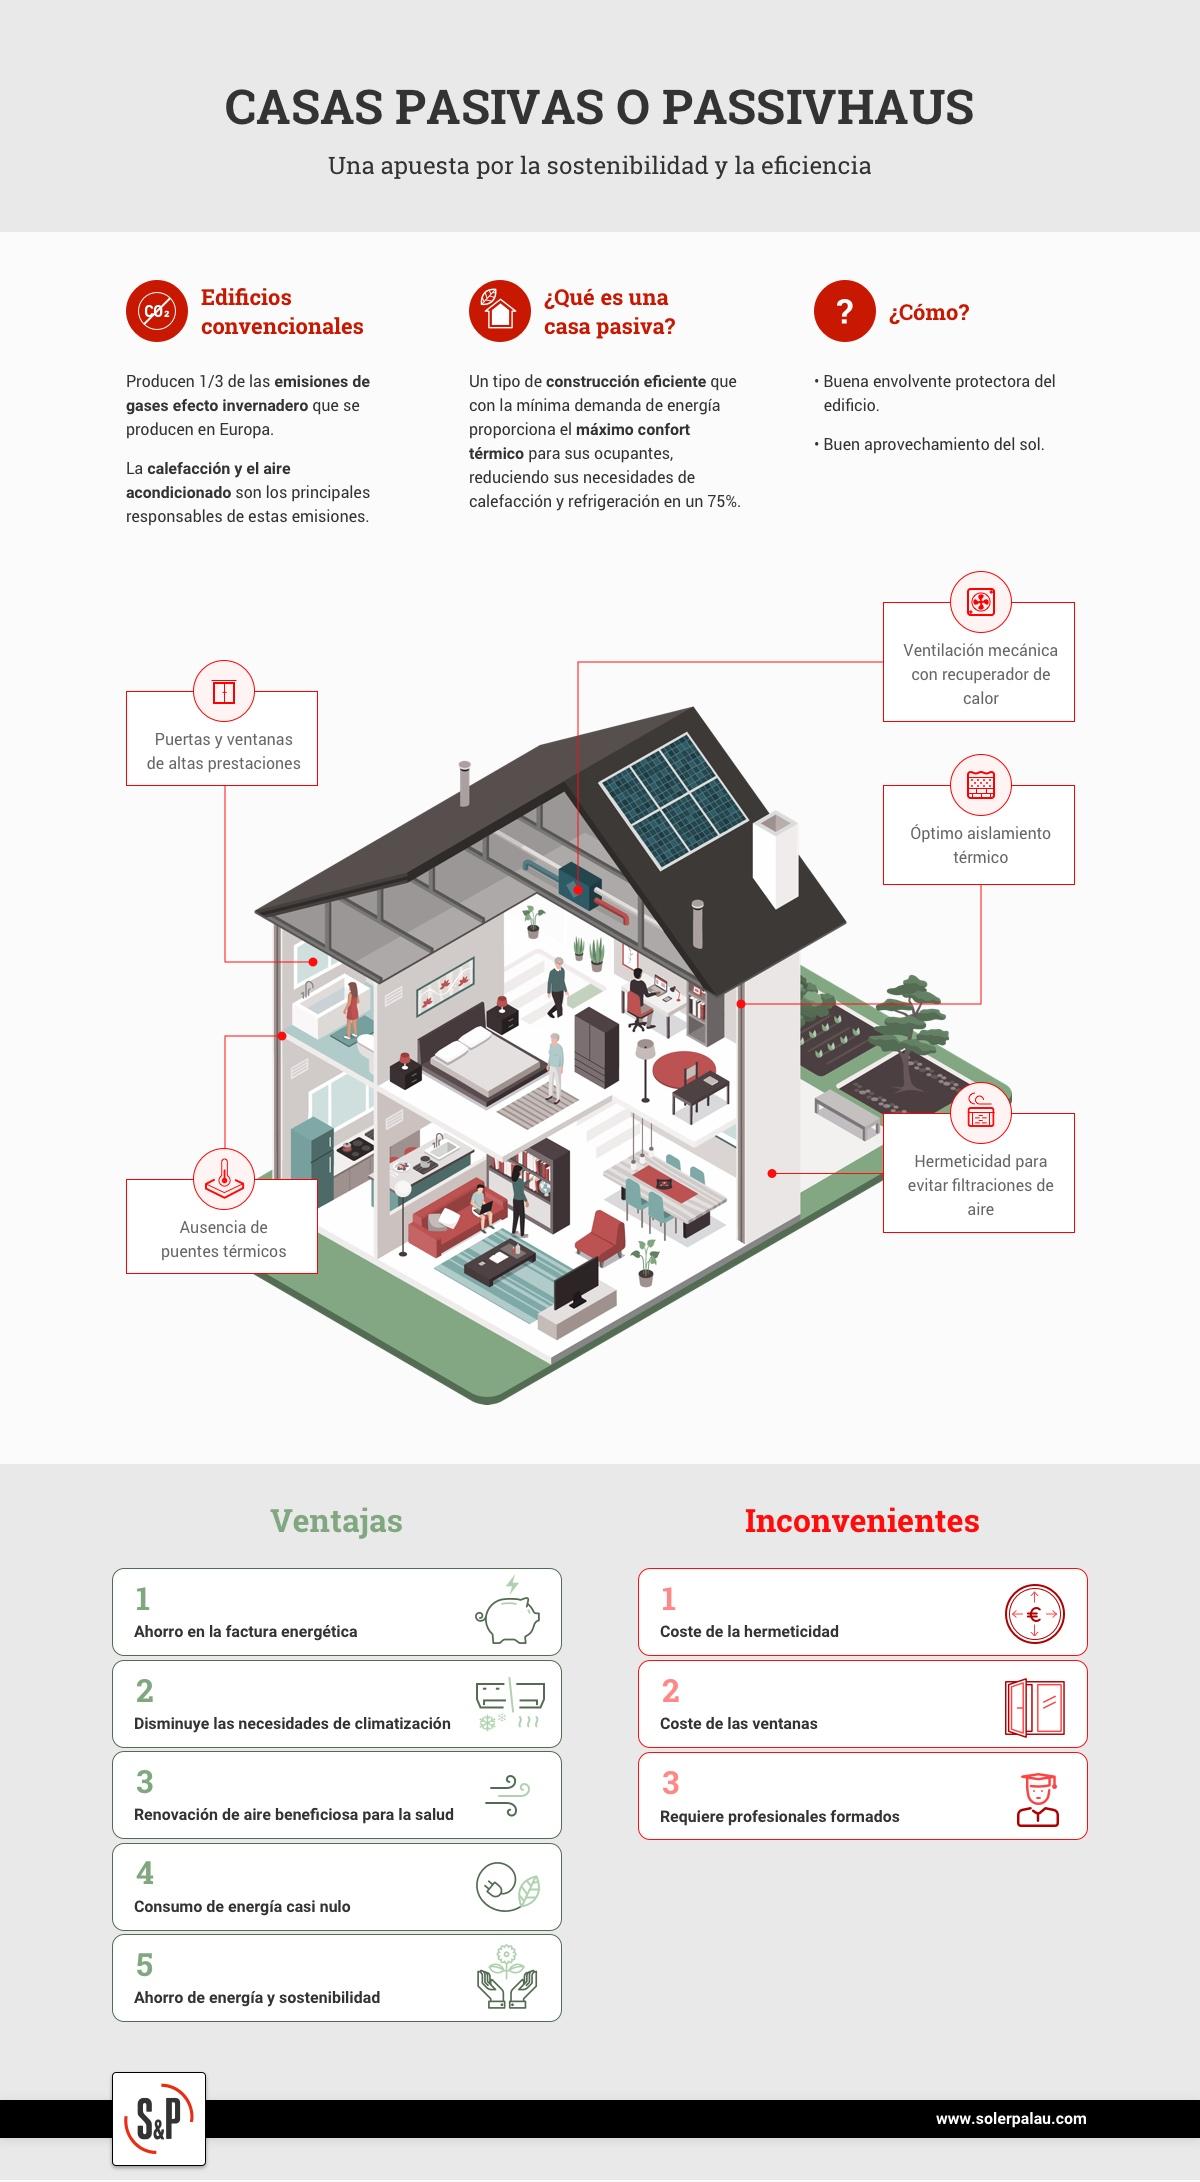 Infografía Casas Pasivas Passivhaus